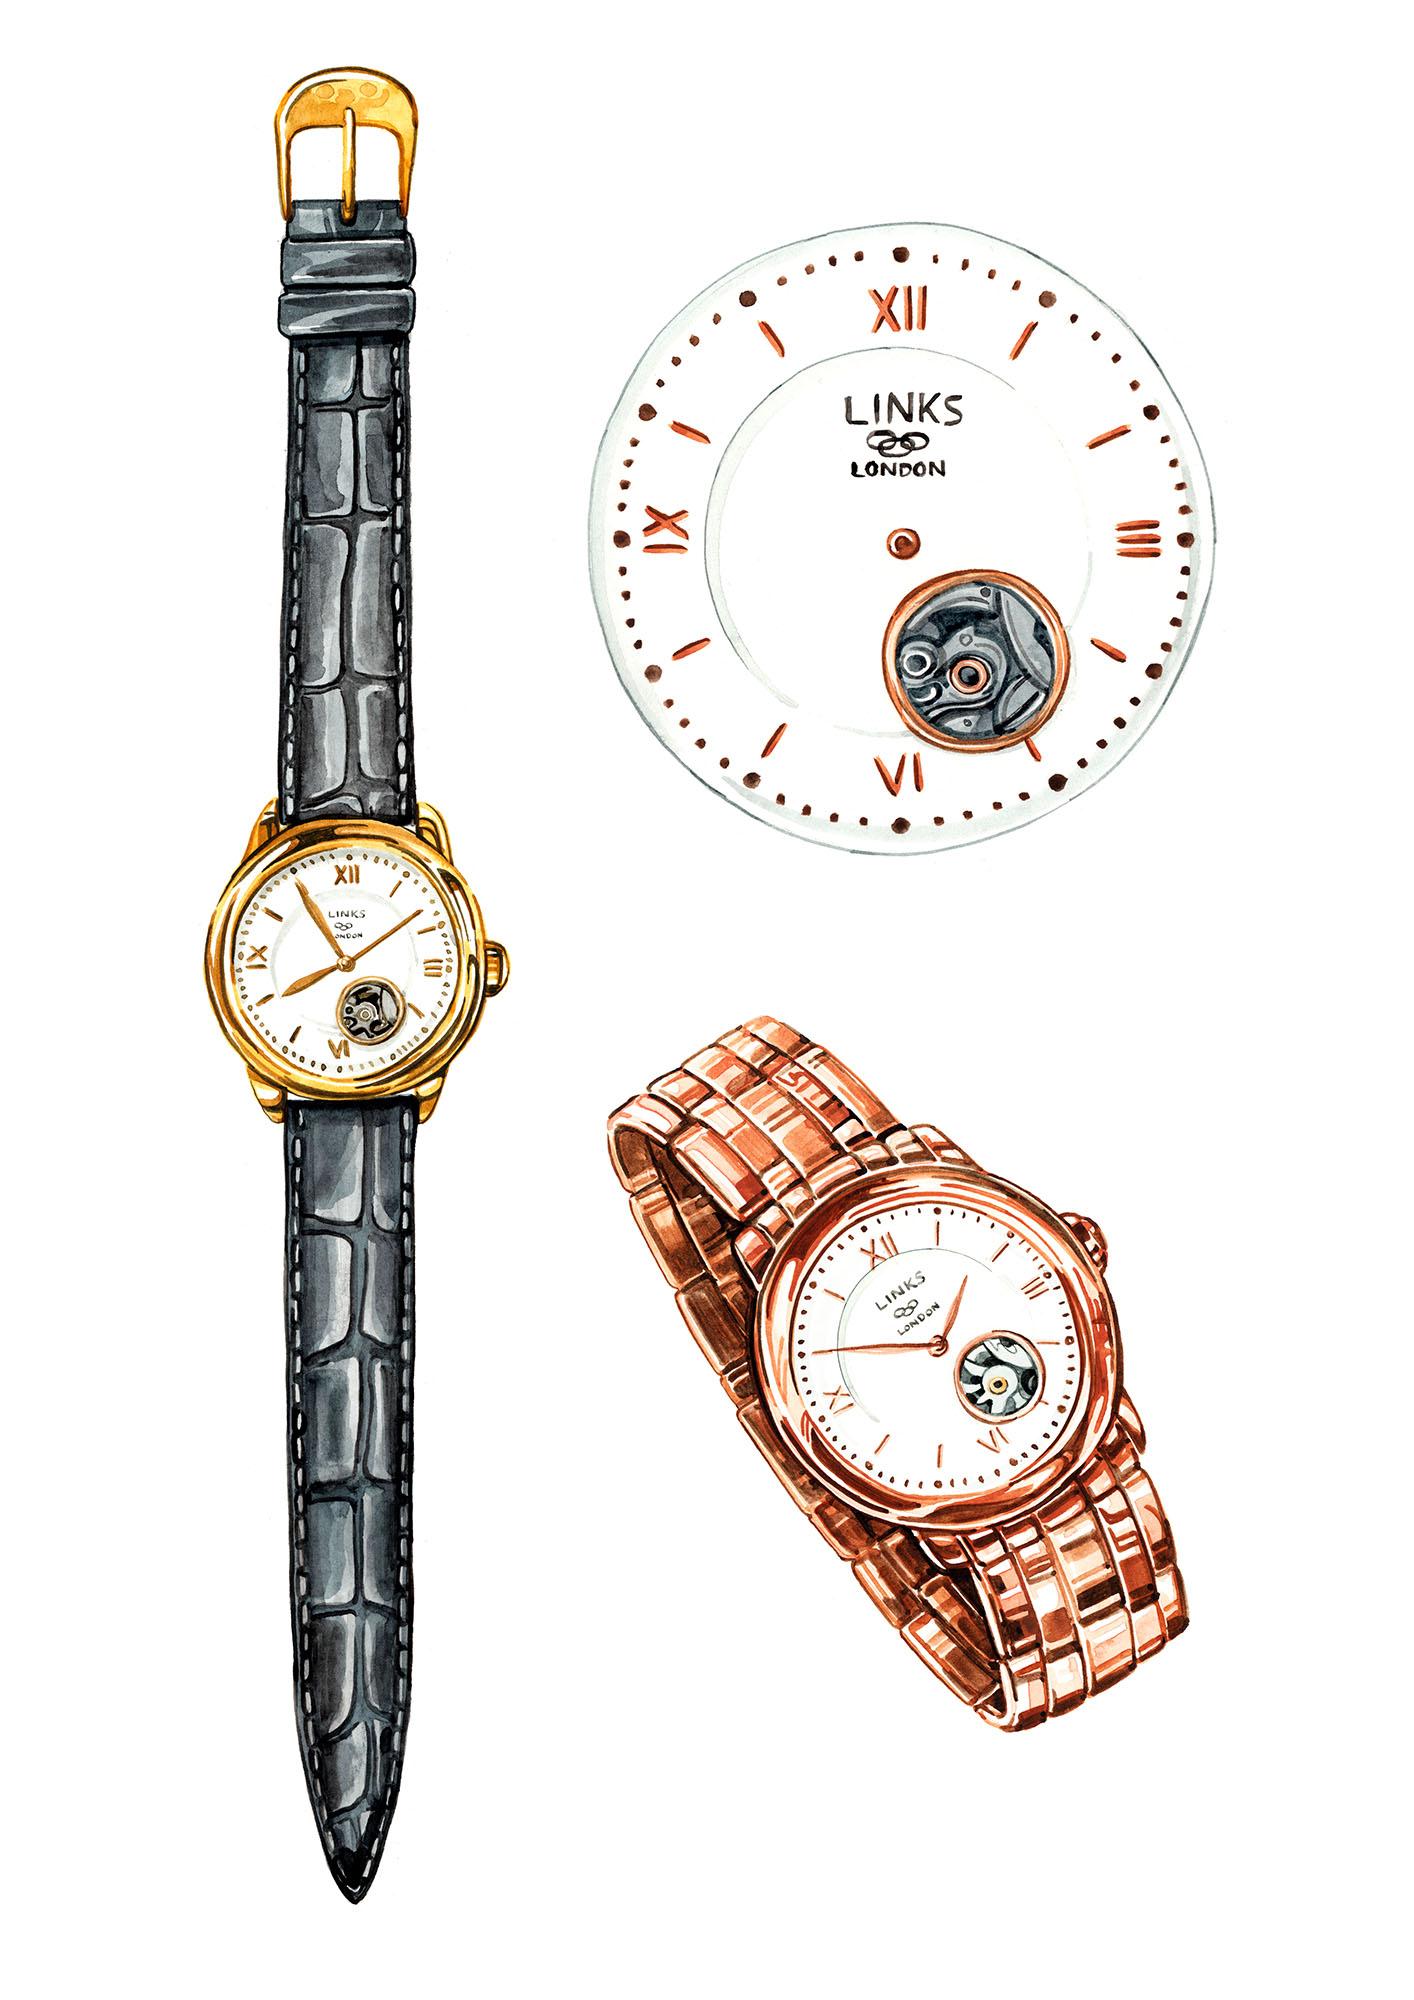 jewellery watch illustration watercolour